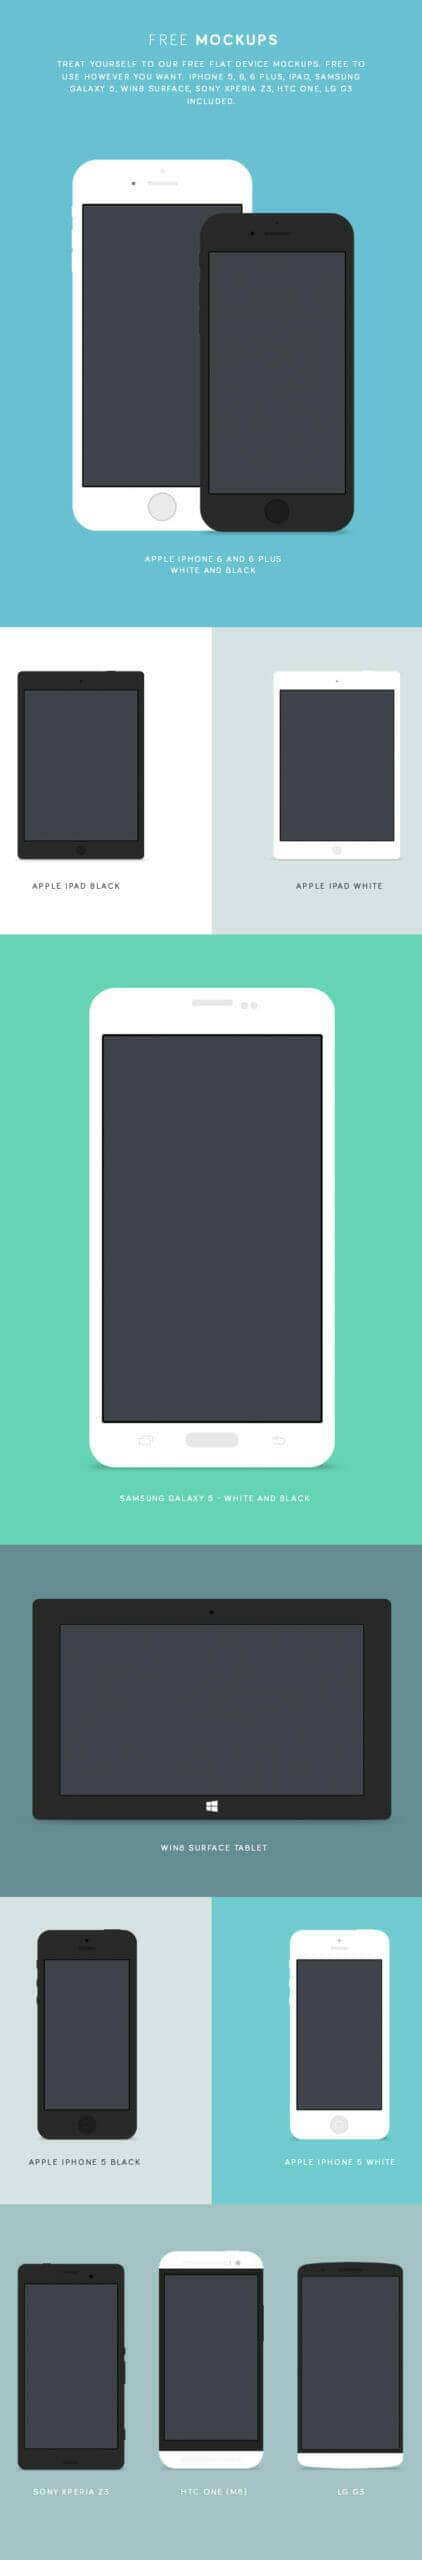 Flat Mobile Device Mockups